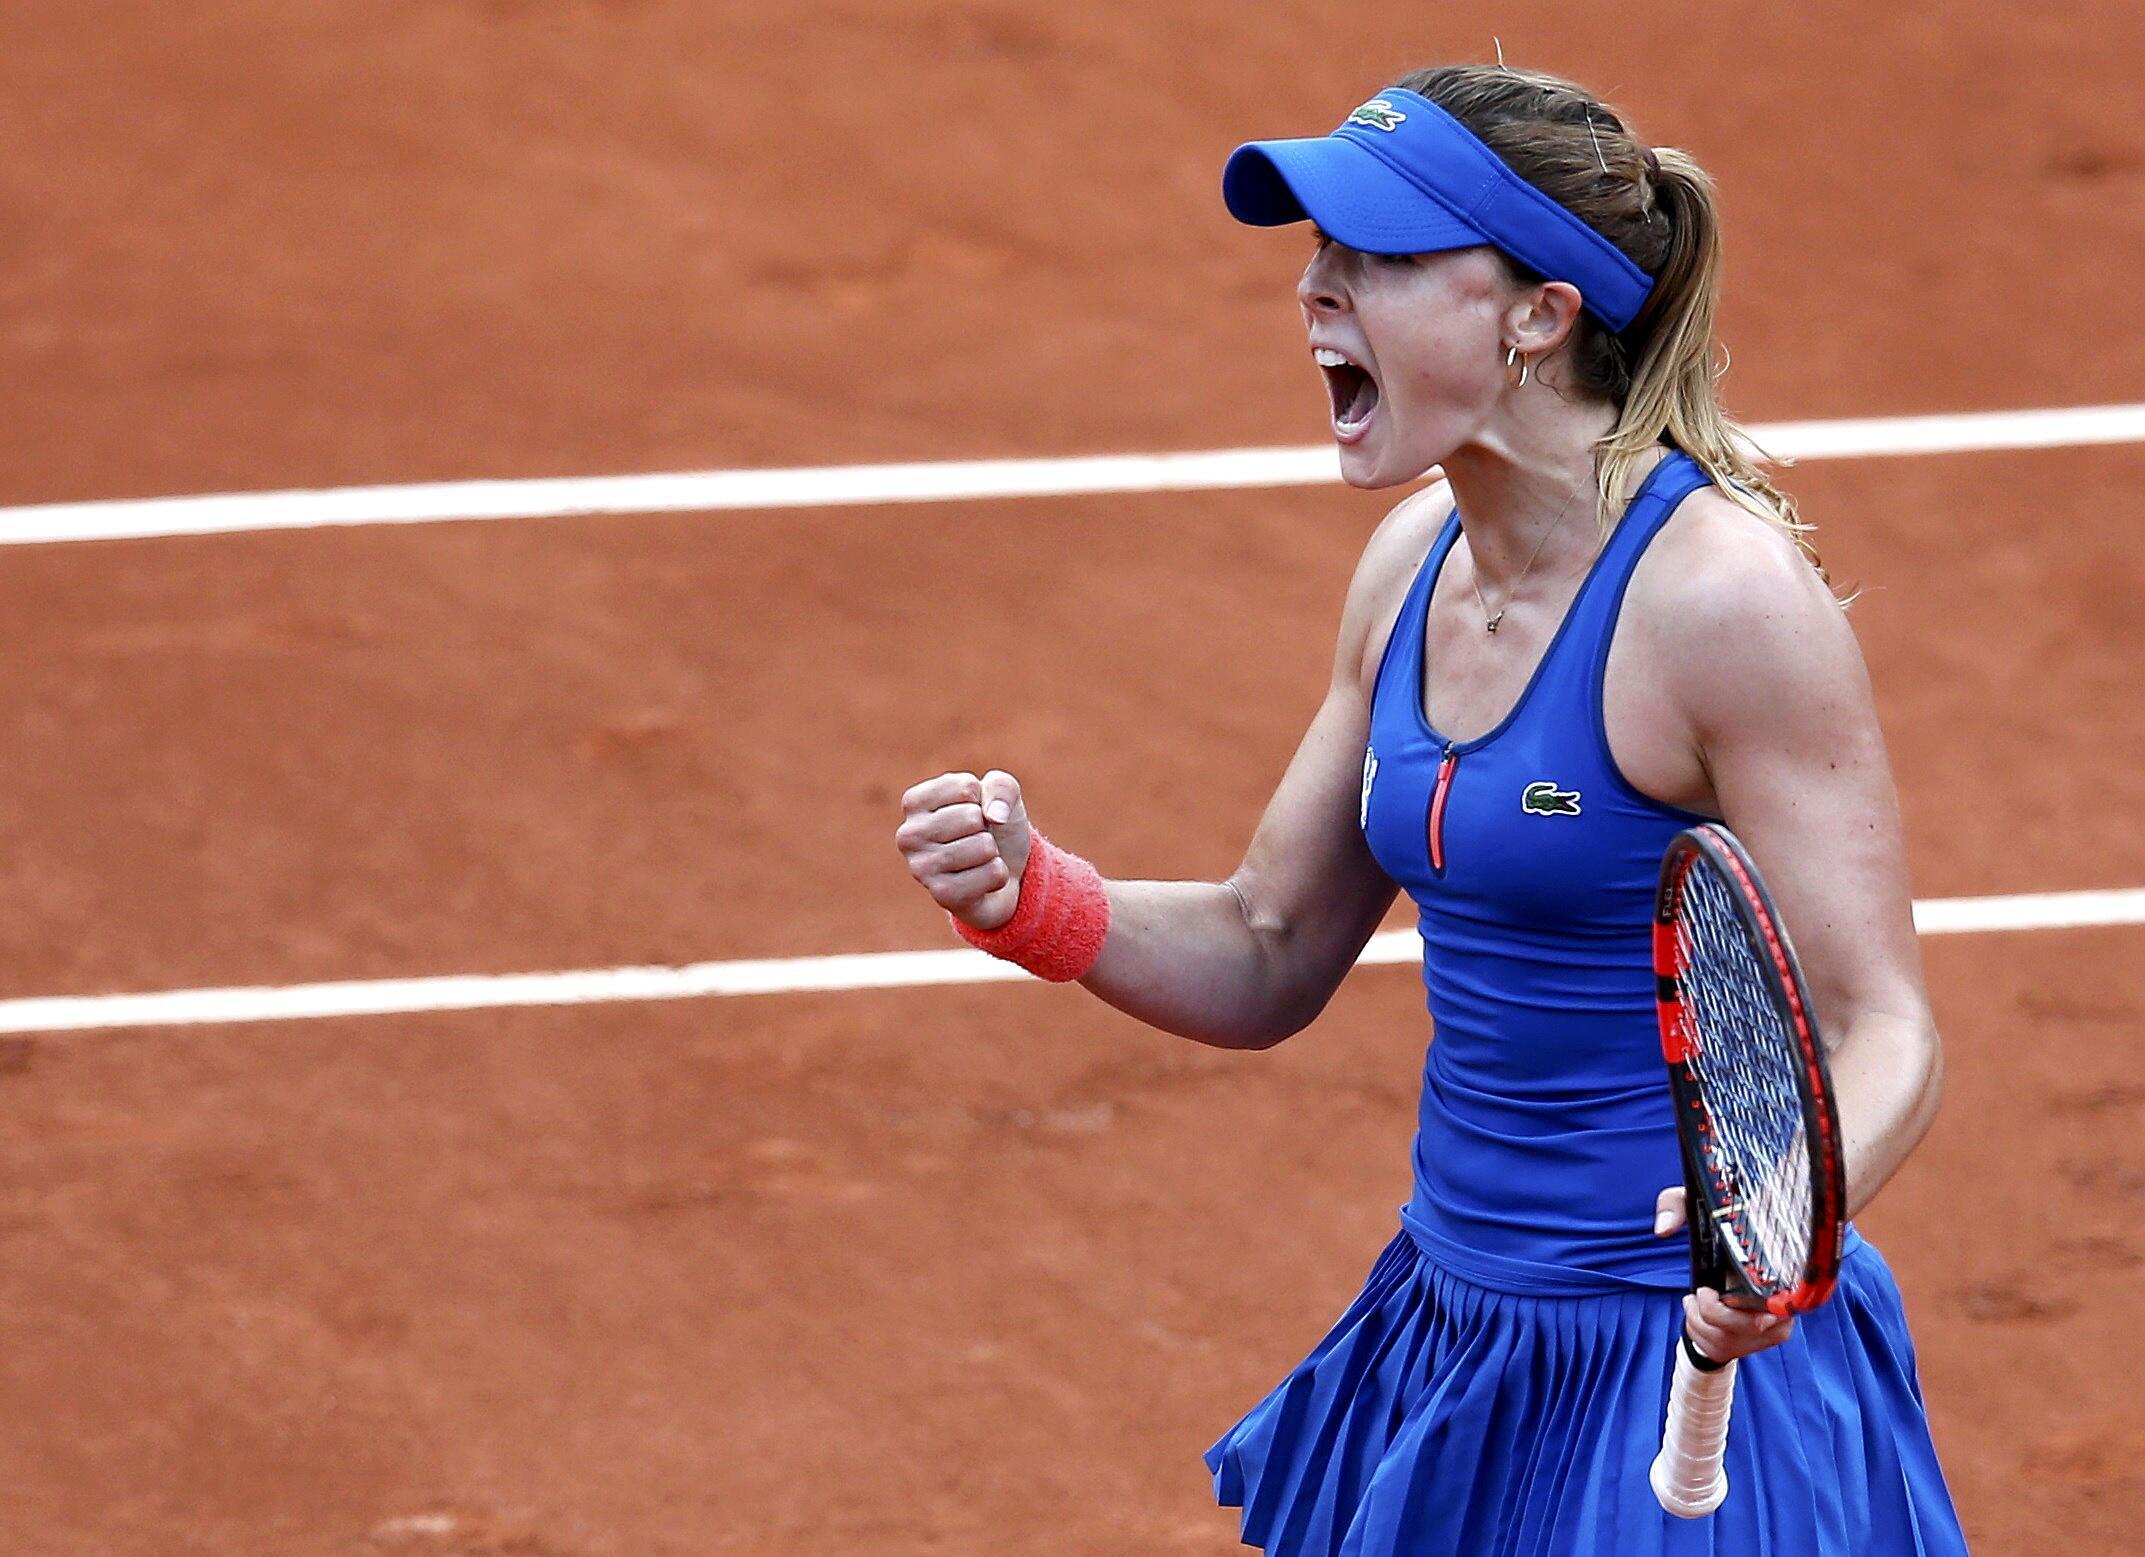 France's Alizé Cornet triumphs over  Roberta Vinci of Italy